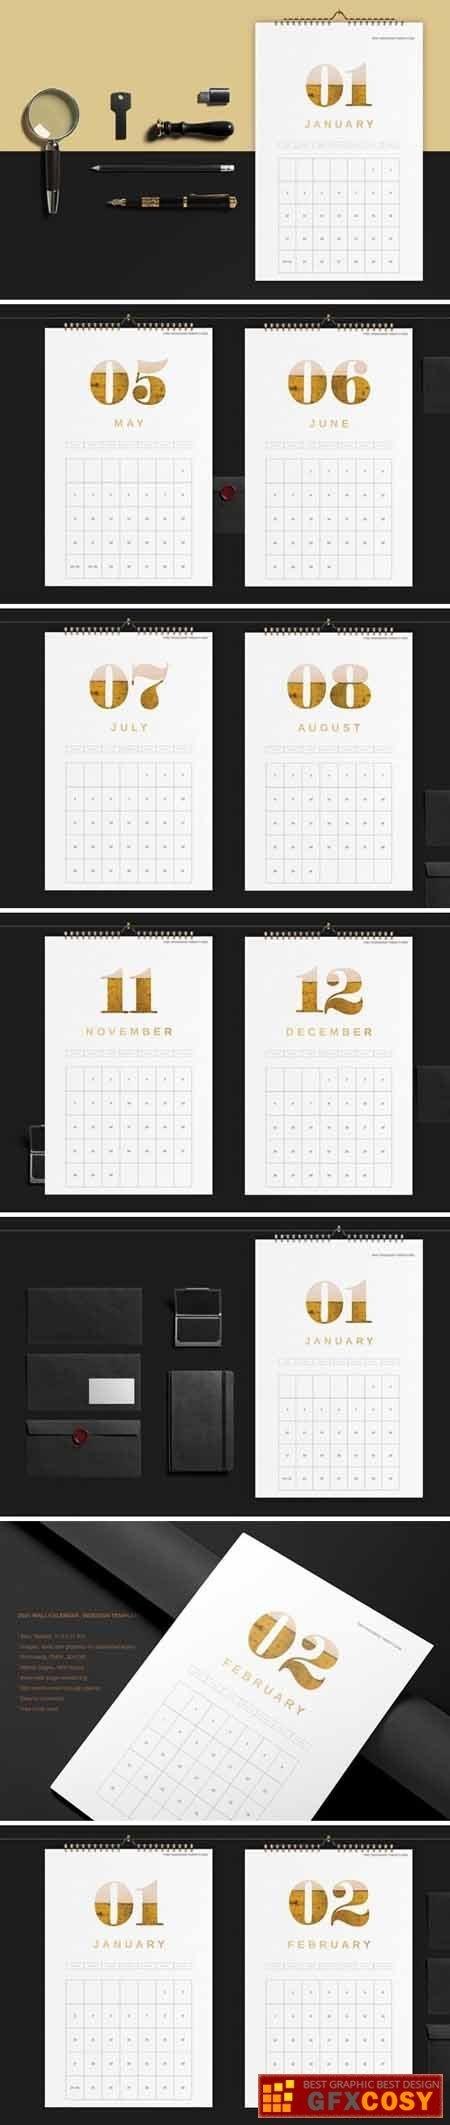 Wall Calendar 2021 Template369 » Free Download Photoshop Vector Stock Image Via Zippyshare with regard to 2021 Indesign Calendar Template